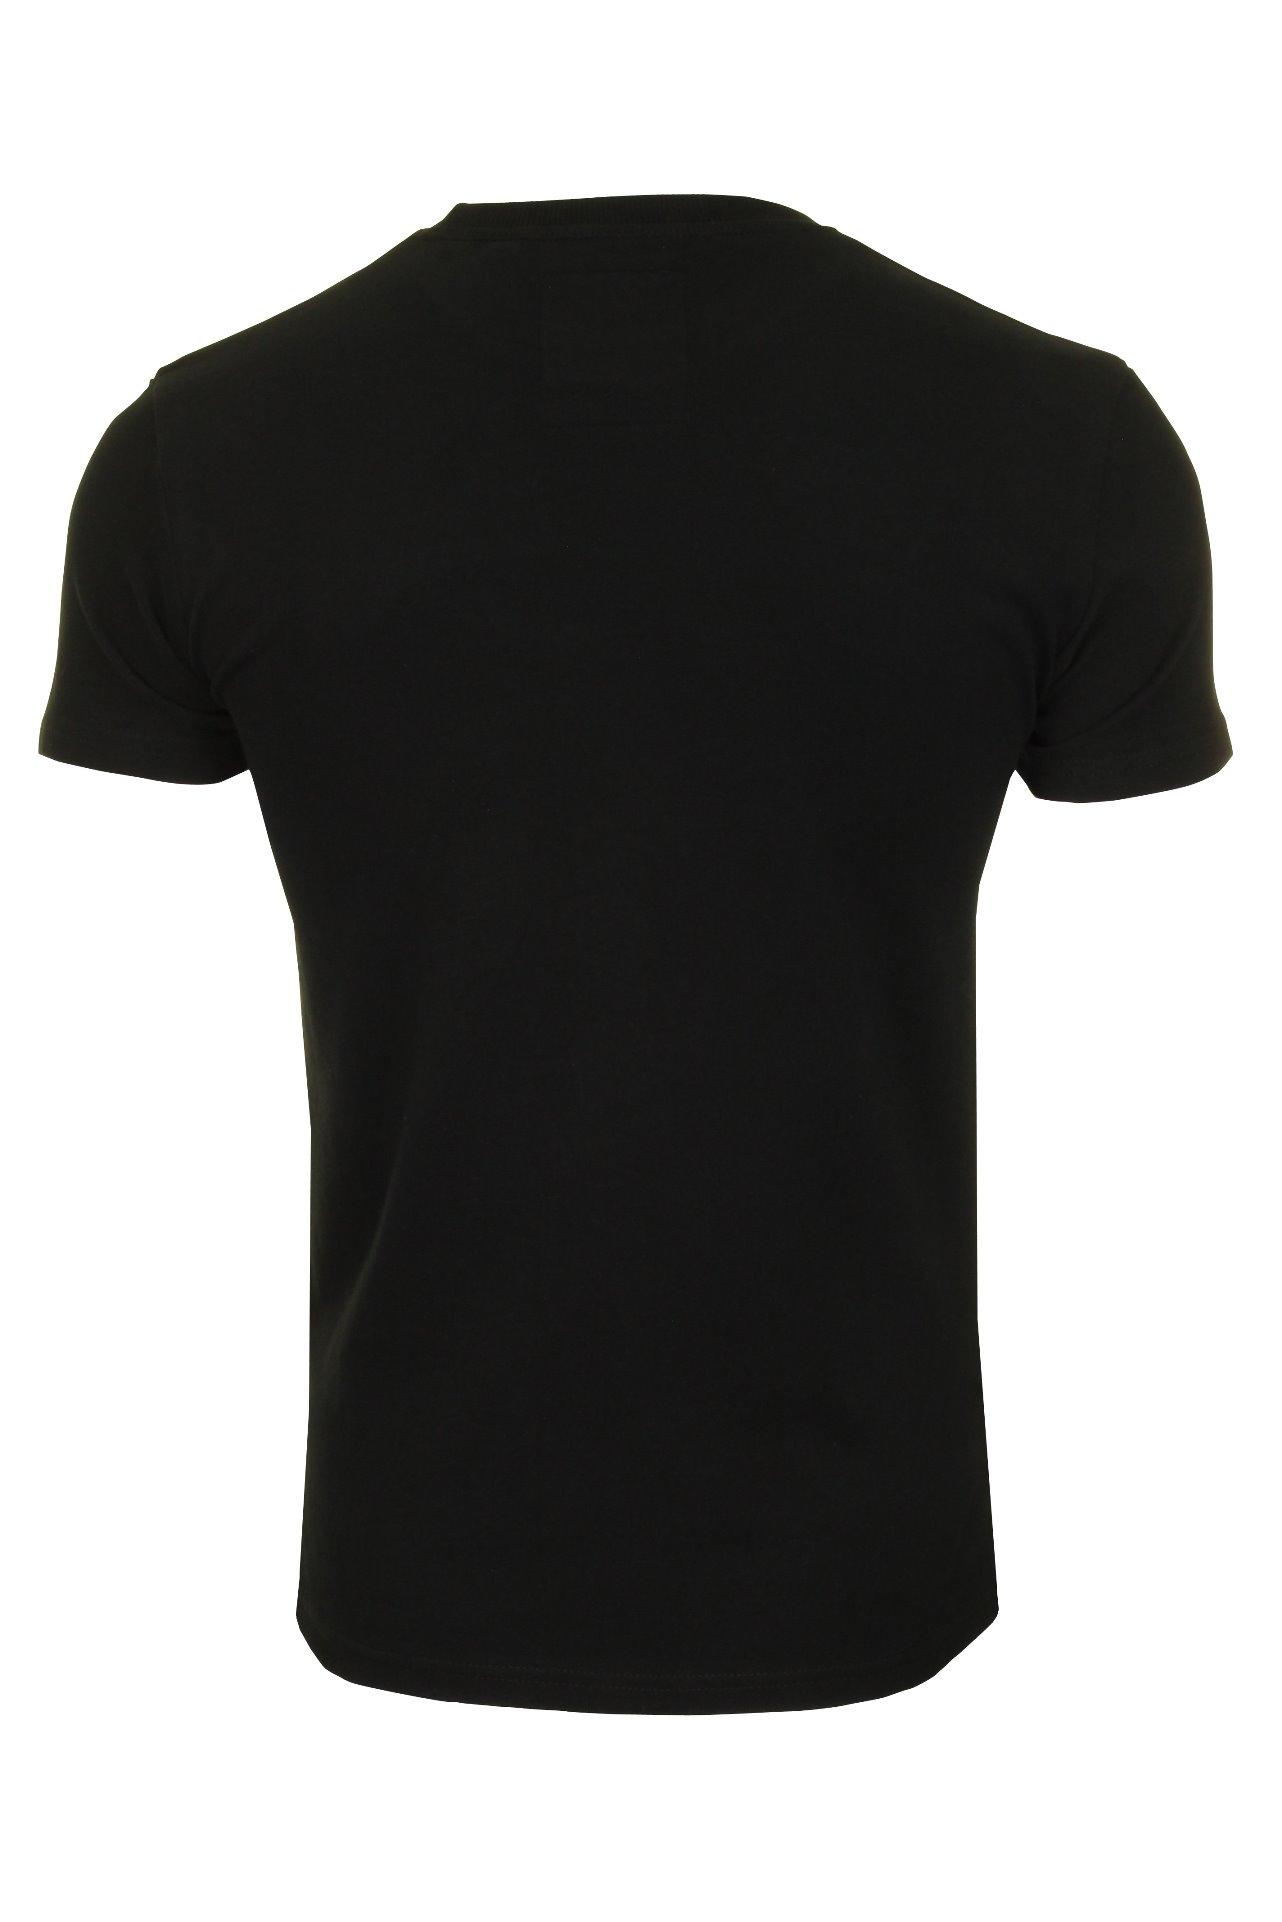 Superdry-Mens-Printed-T-Shirt-039-Retro-Sport-Tonal-Tee-039-Short-Sleeved thumbnail 5